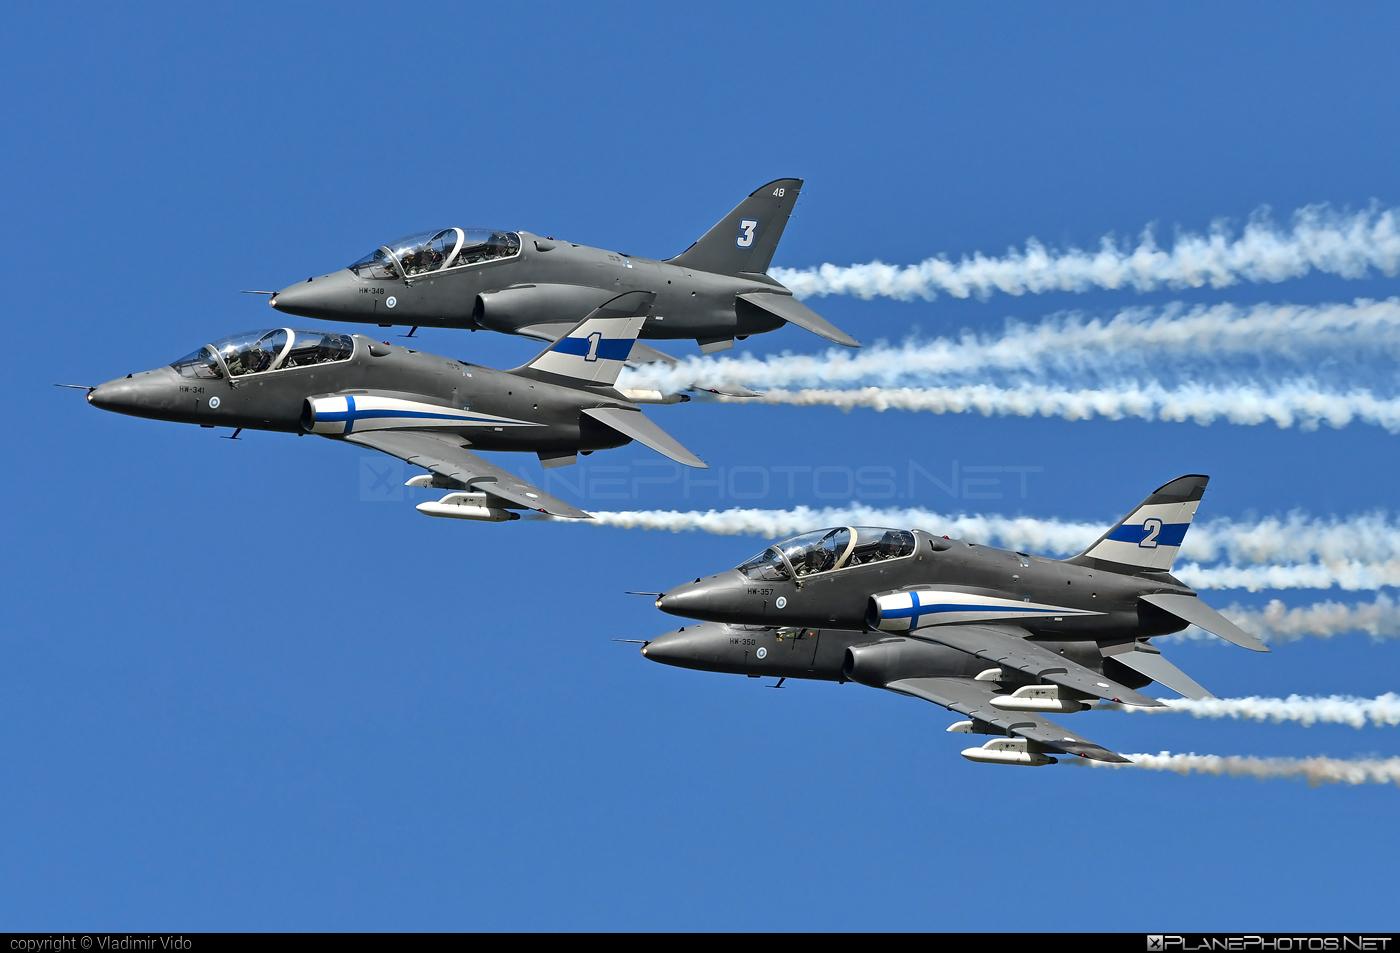 British Aerospace Hawk 51A - HW-357 operated by Ilmavoimat (Finnish Air Force) #baehawk #baehawk51 #baehawk51a #britishaerospace #britishaerospacehawk #britishaerospacehawk51 #britishaerospacehawk51a #finnishairforce #hawk51a #ilmavoimat #midnighthawks #natodays2019